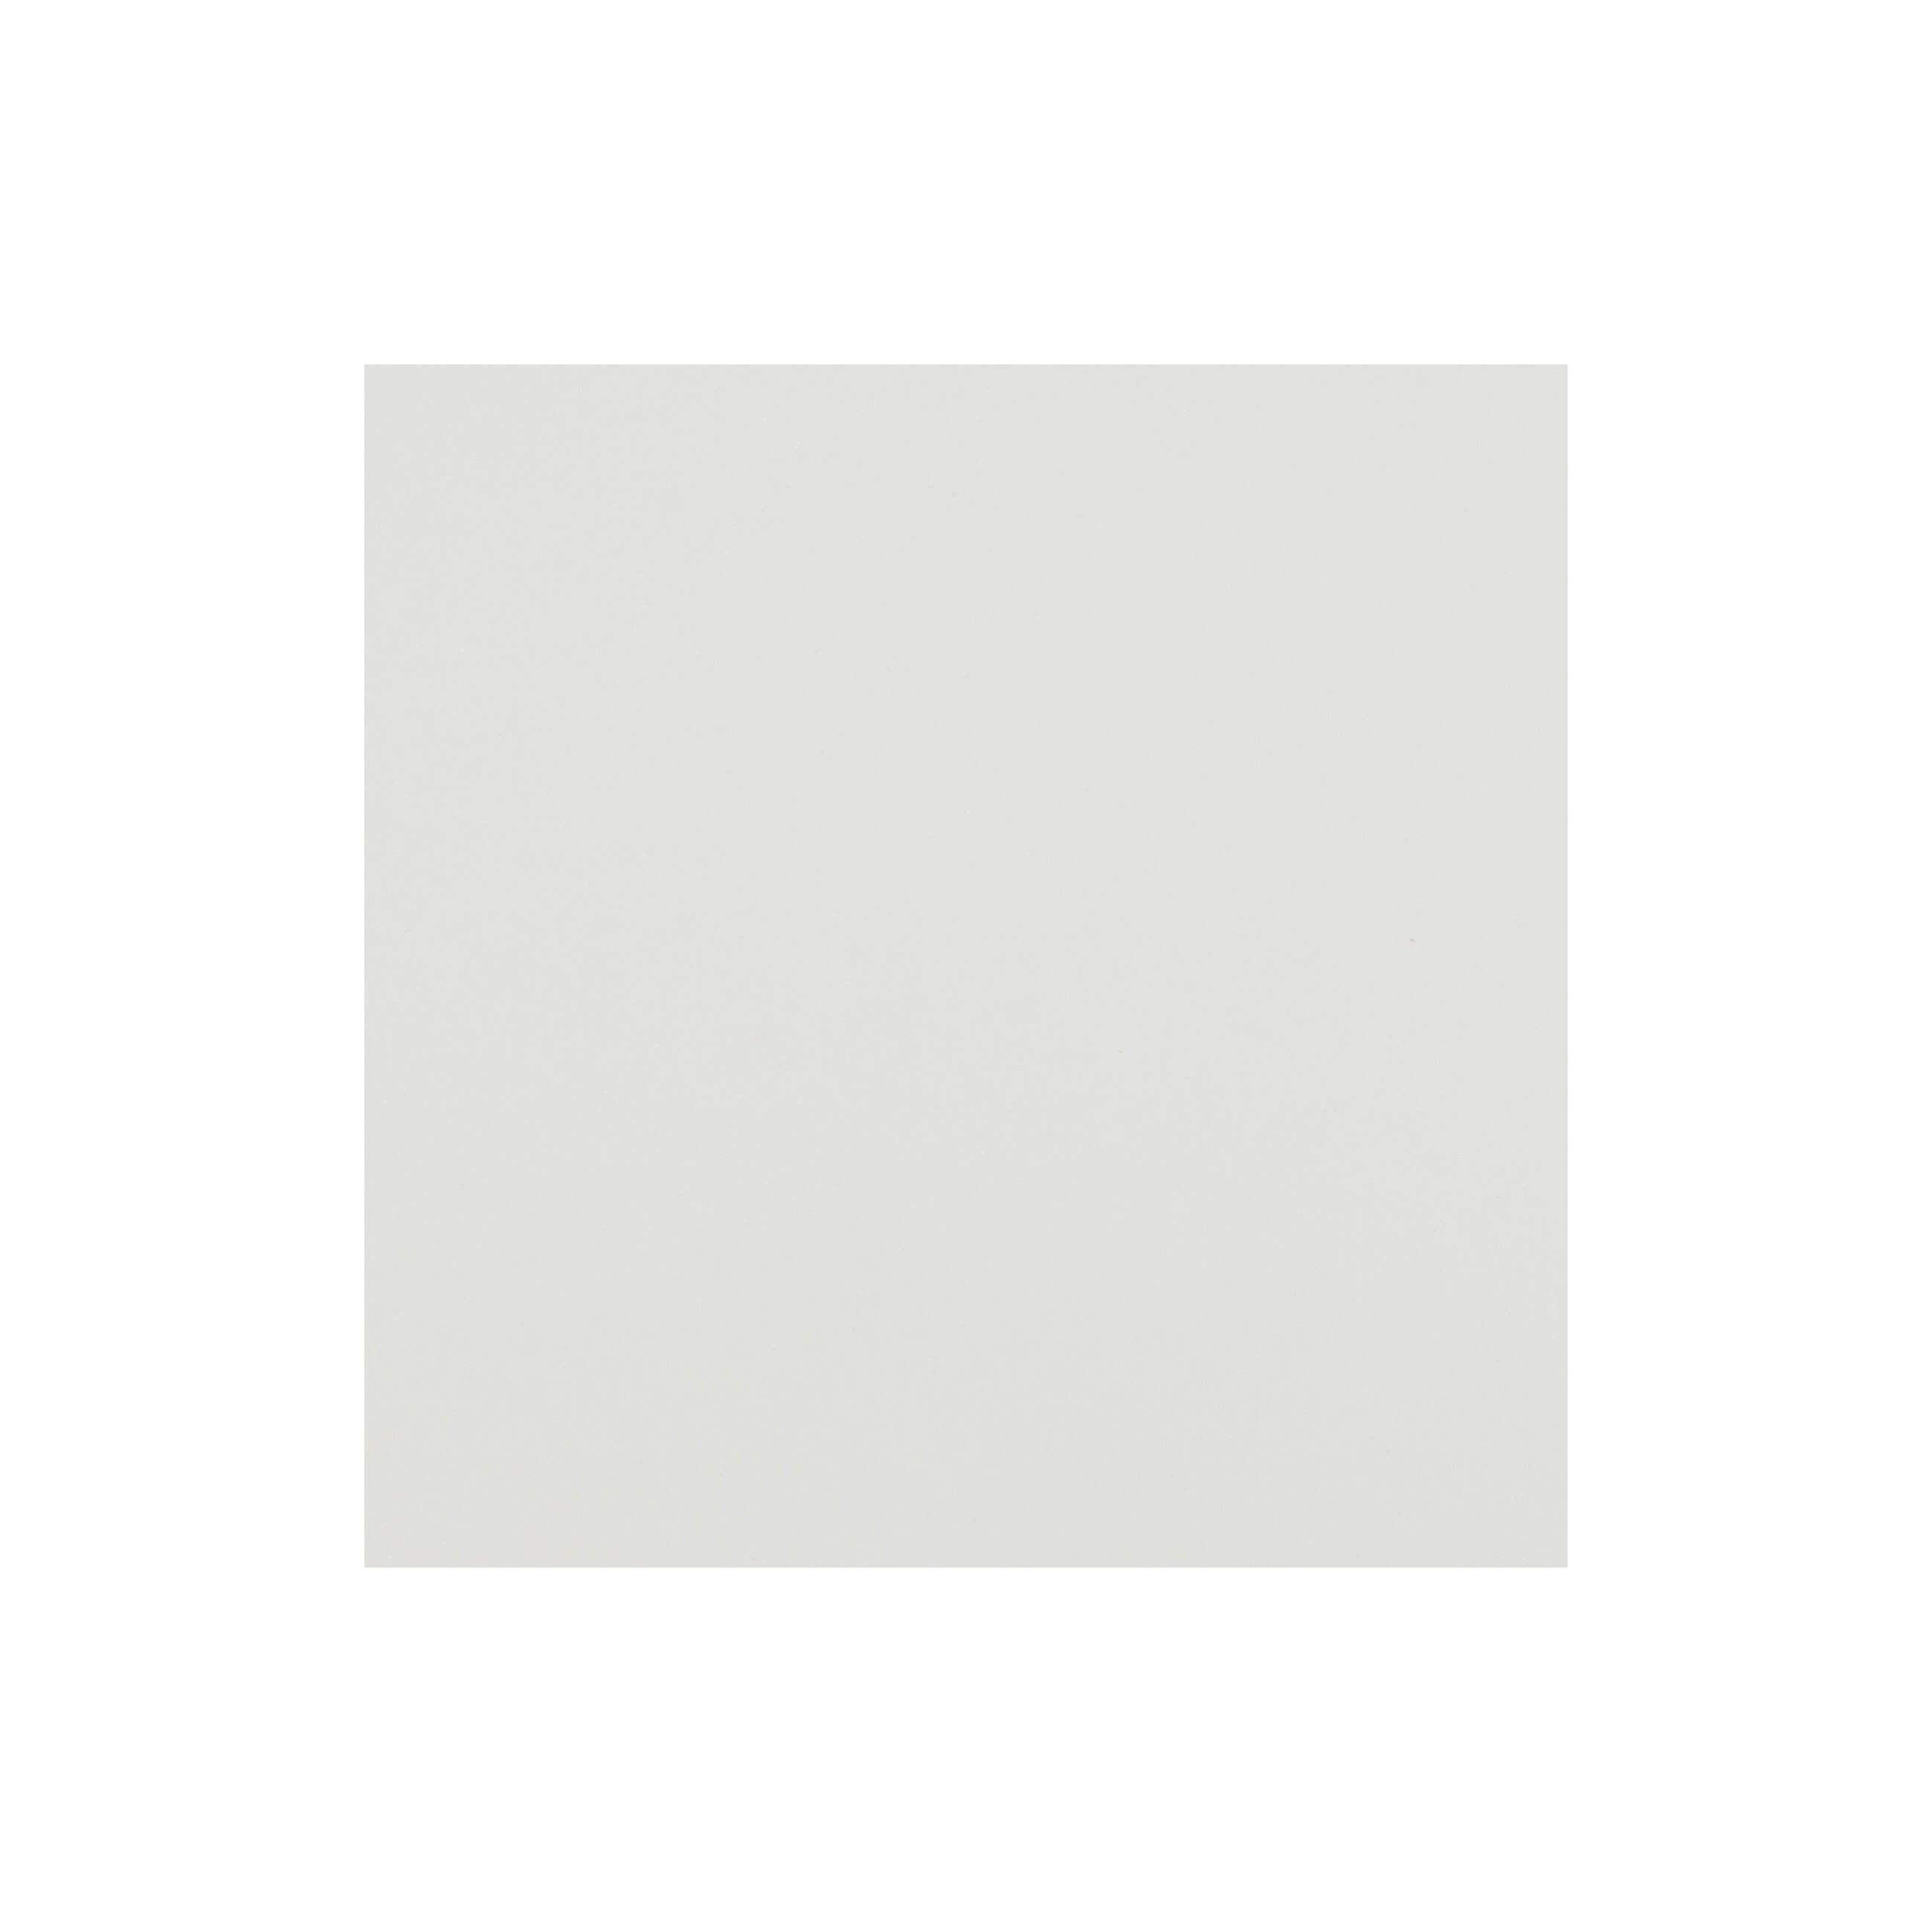 Enfolio Pocketfold (Lg Sq) Cardmount - Ivory Sparkle